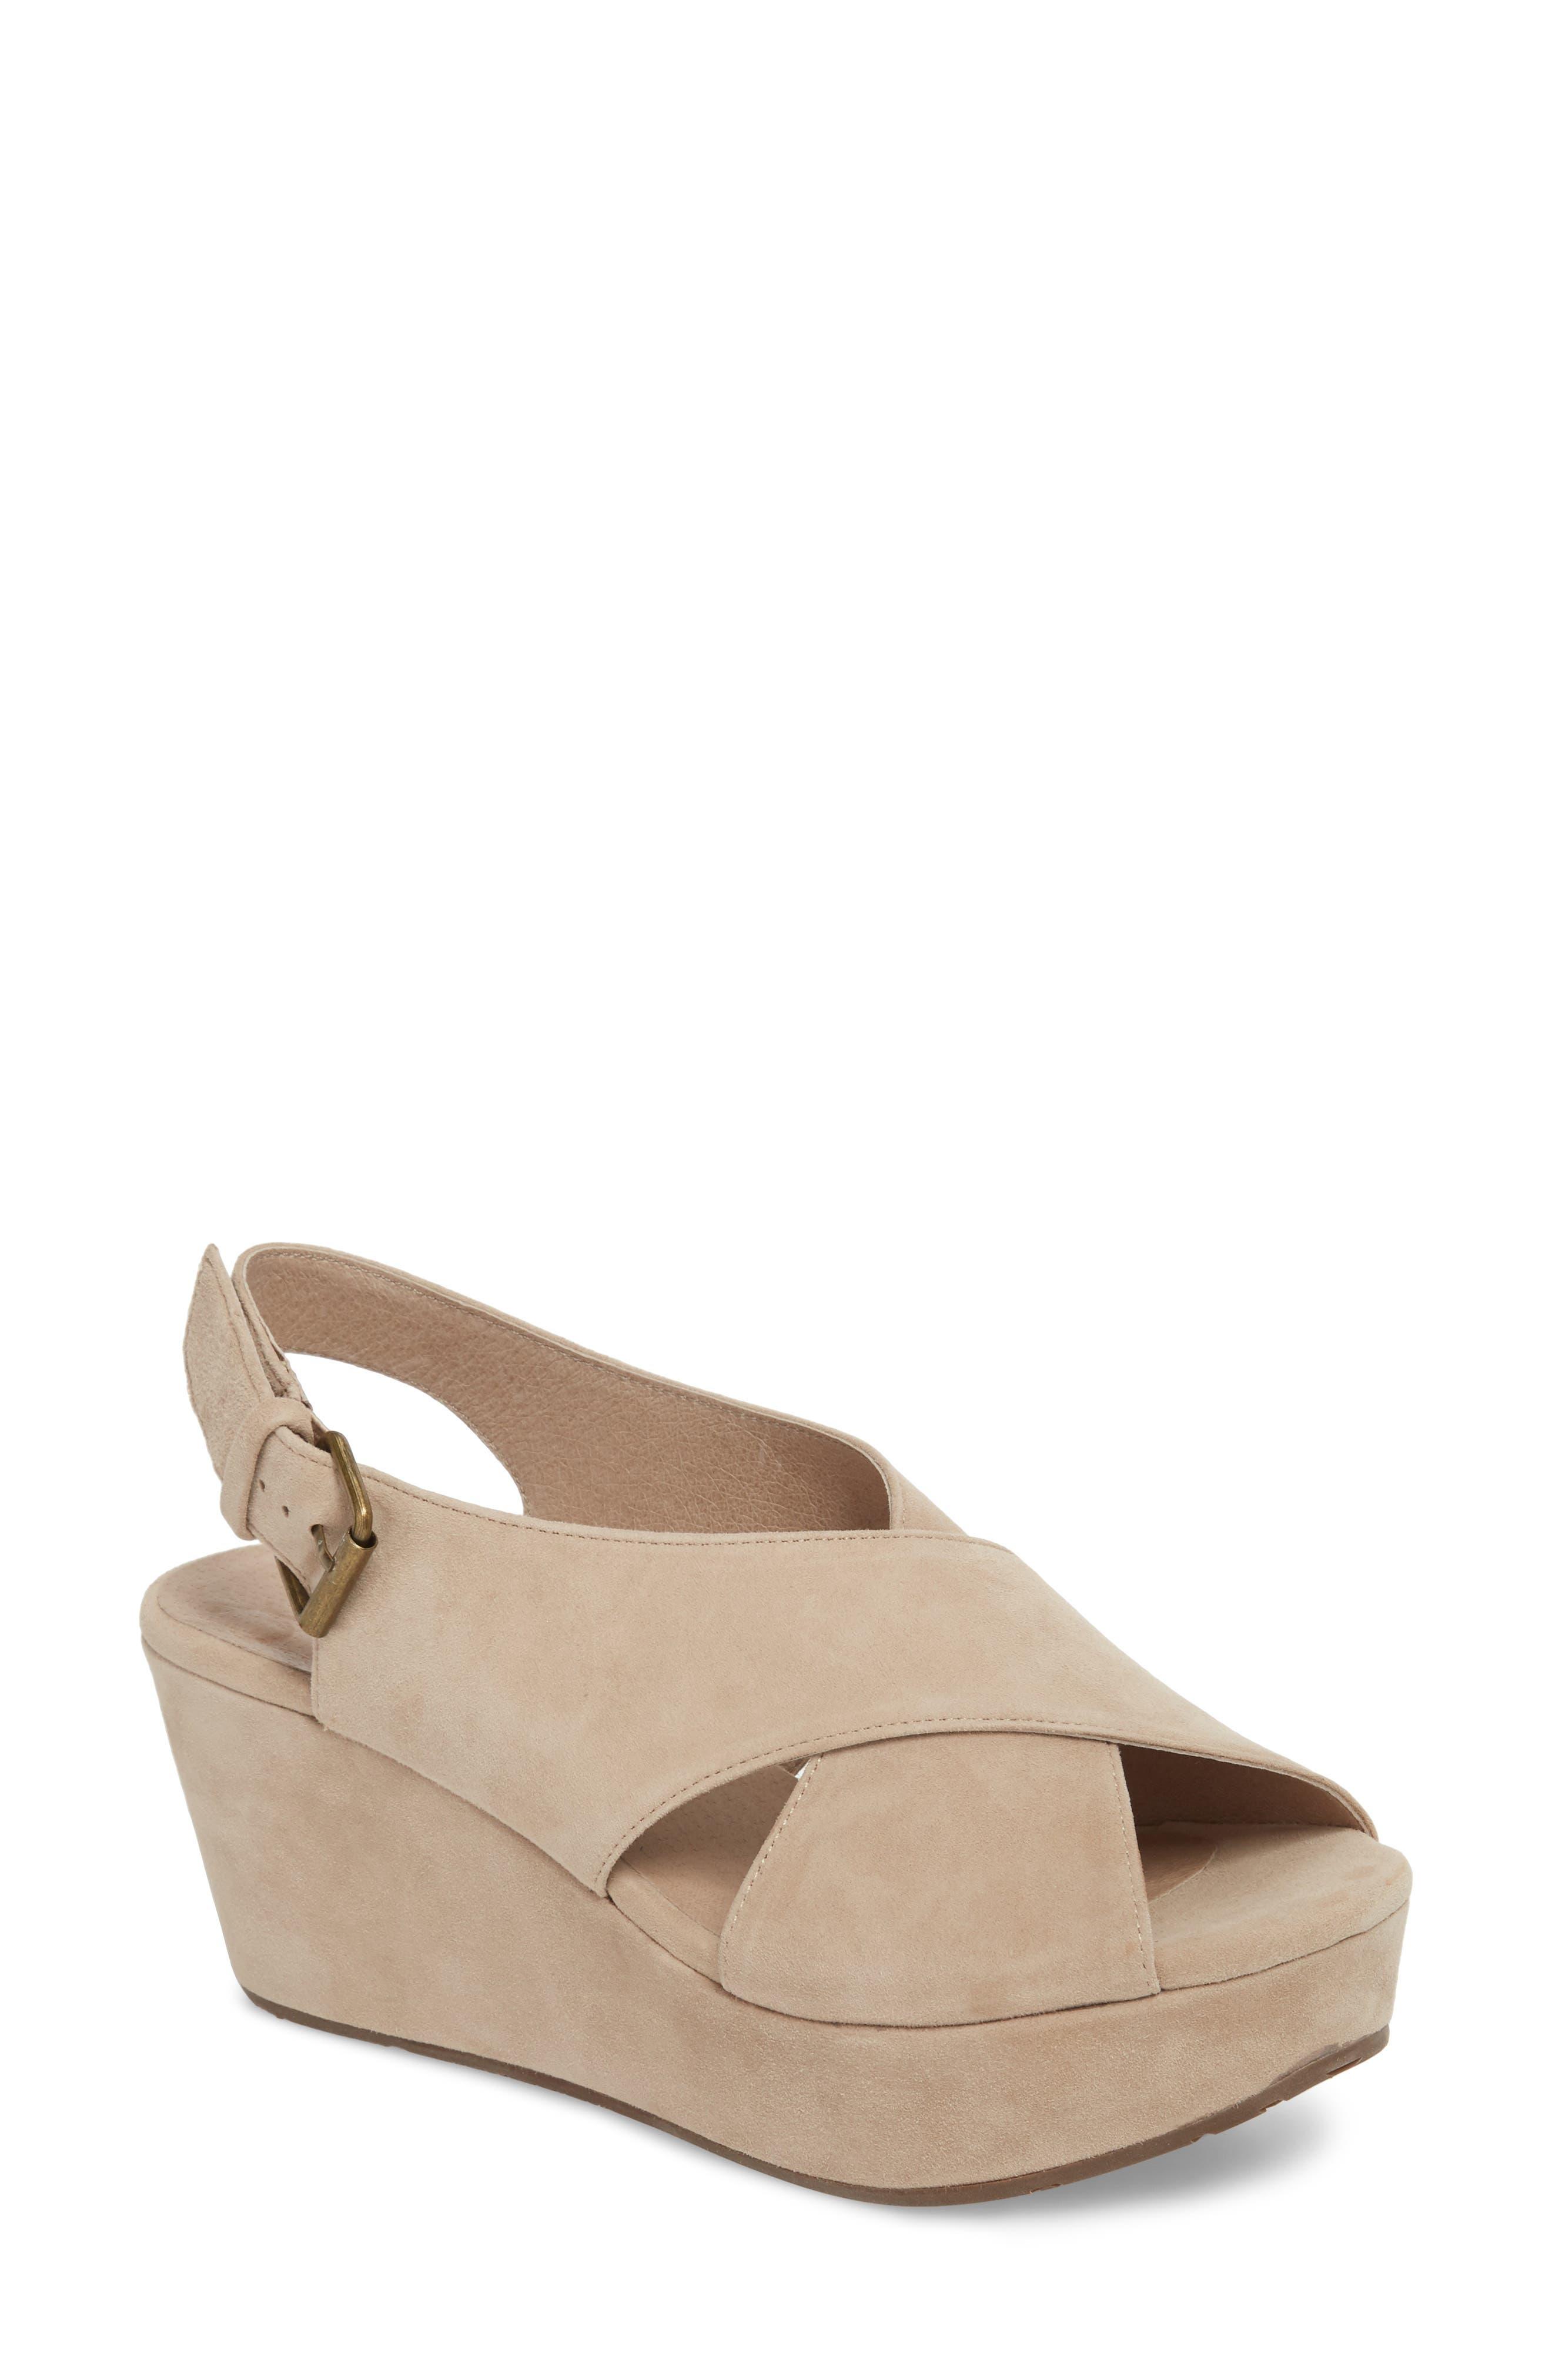 Wim Platform Wedge Sandal